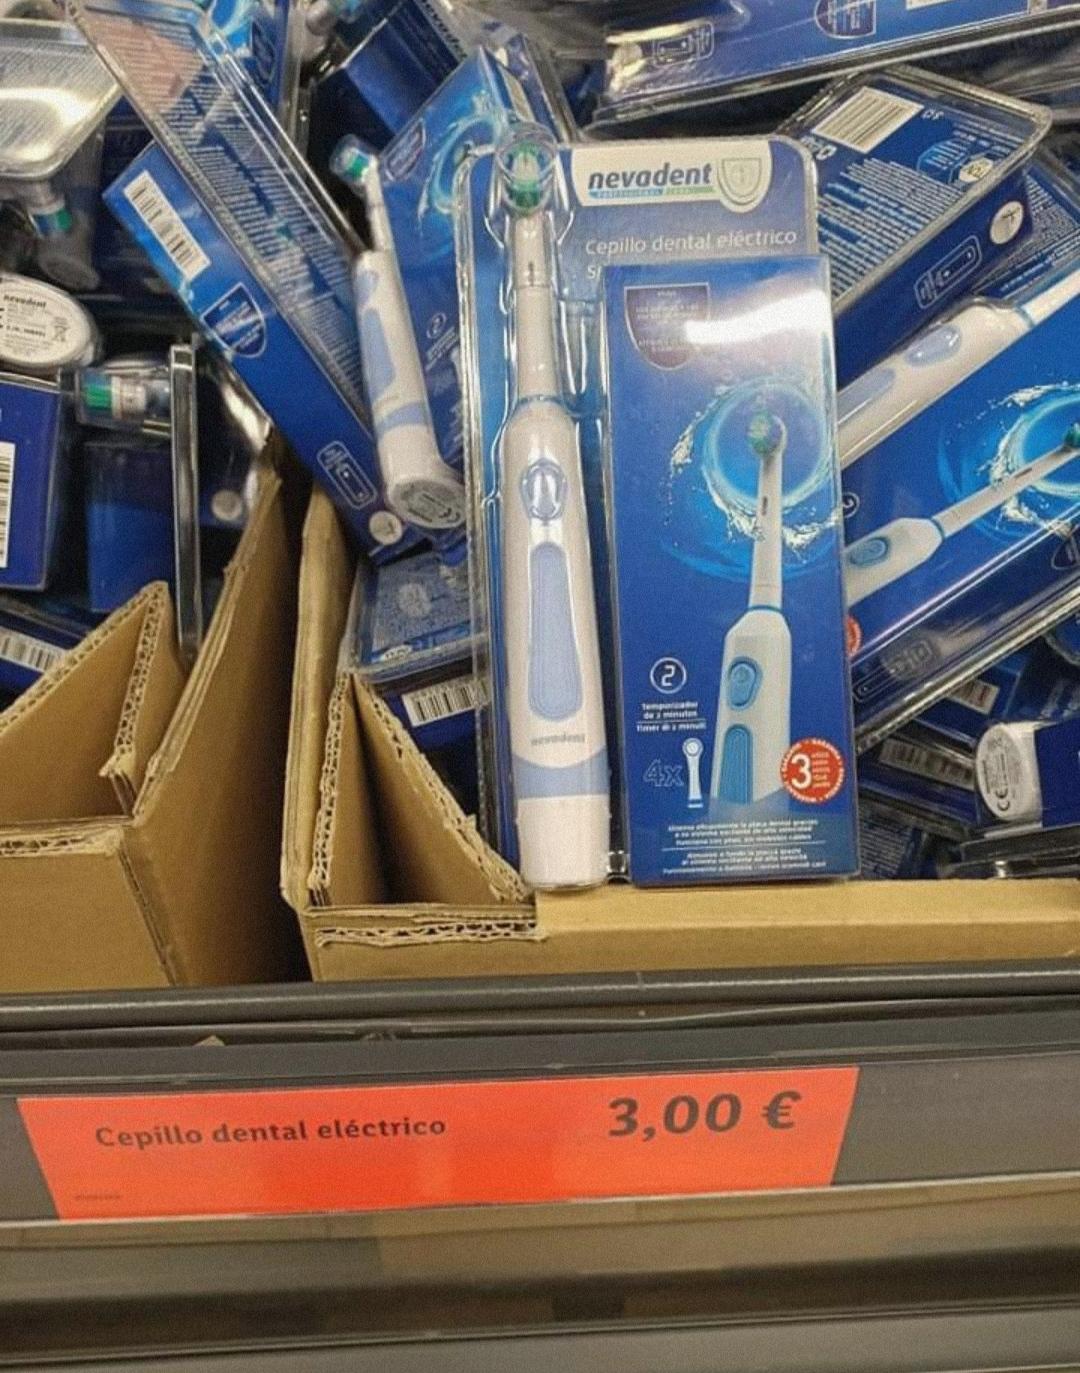 Cepillo dental eléctrico en Factory Discount de Alcalá de Henares